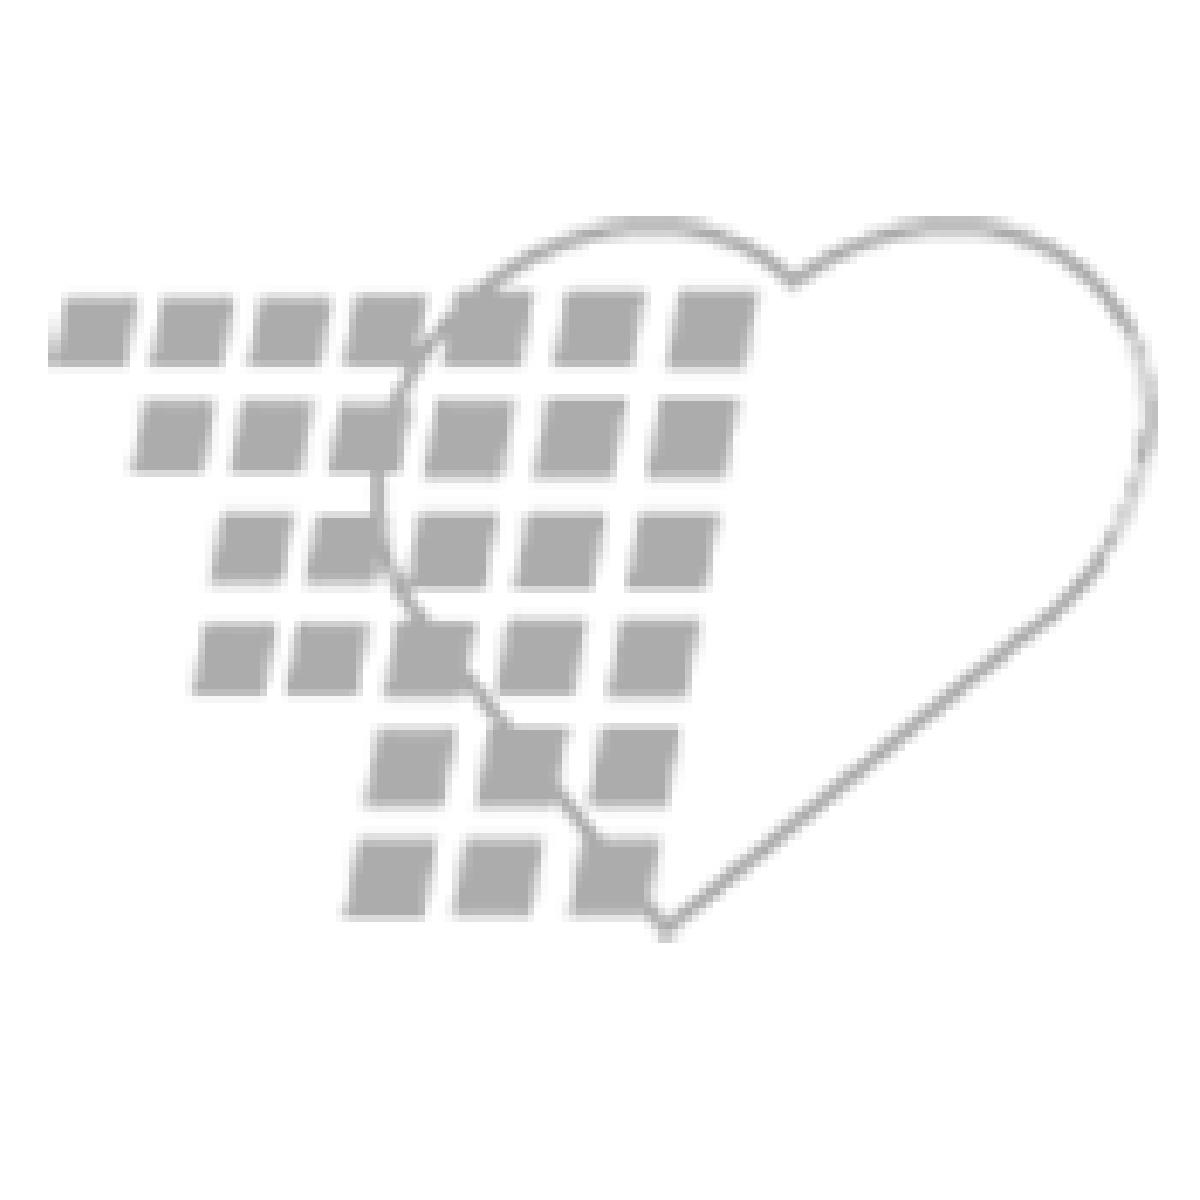 11-79-2101 Simulaids SimVS Prehospital Defib